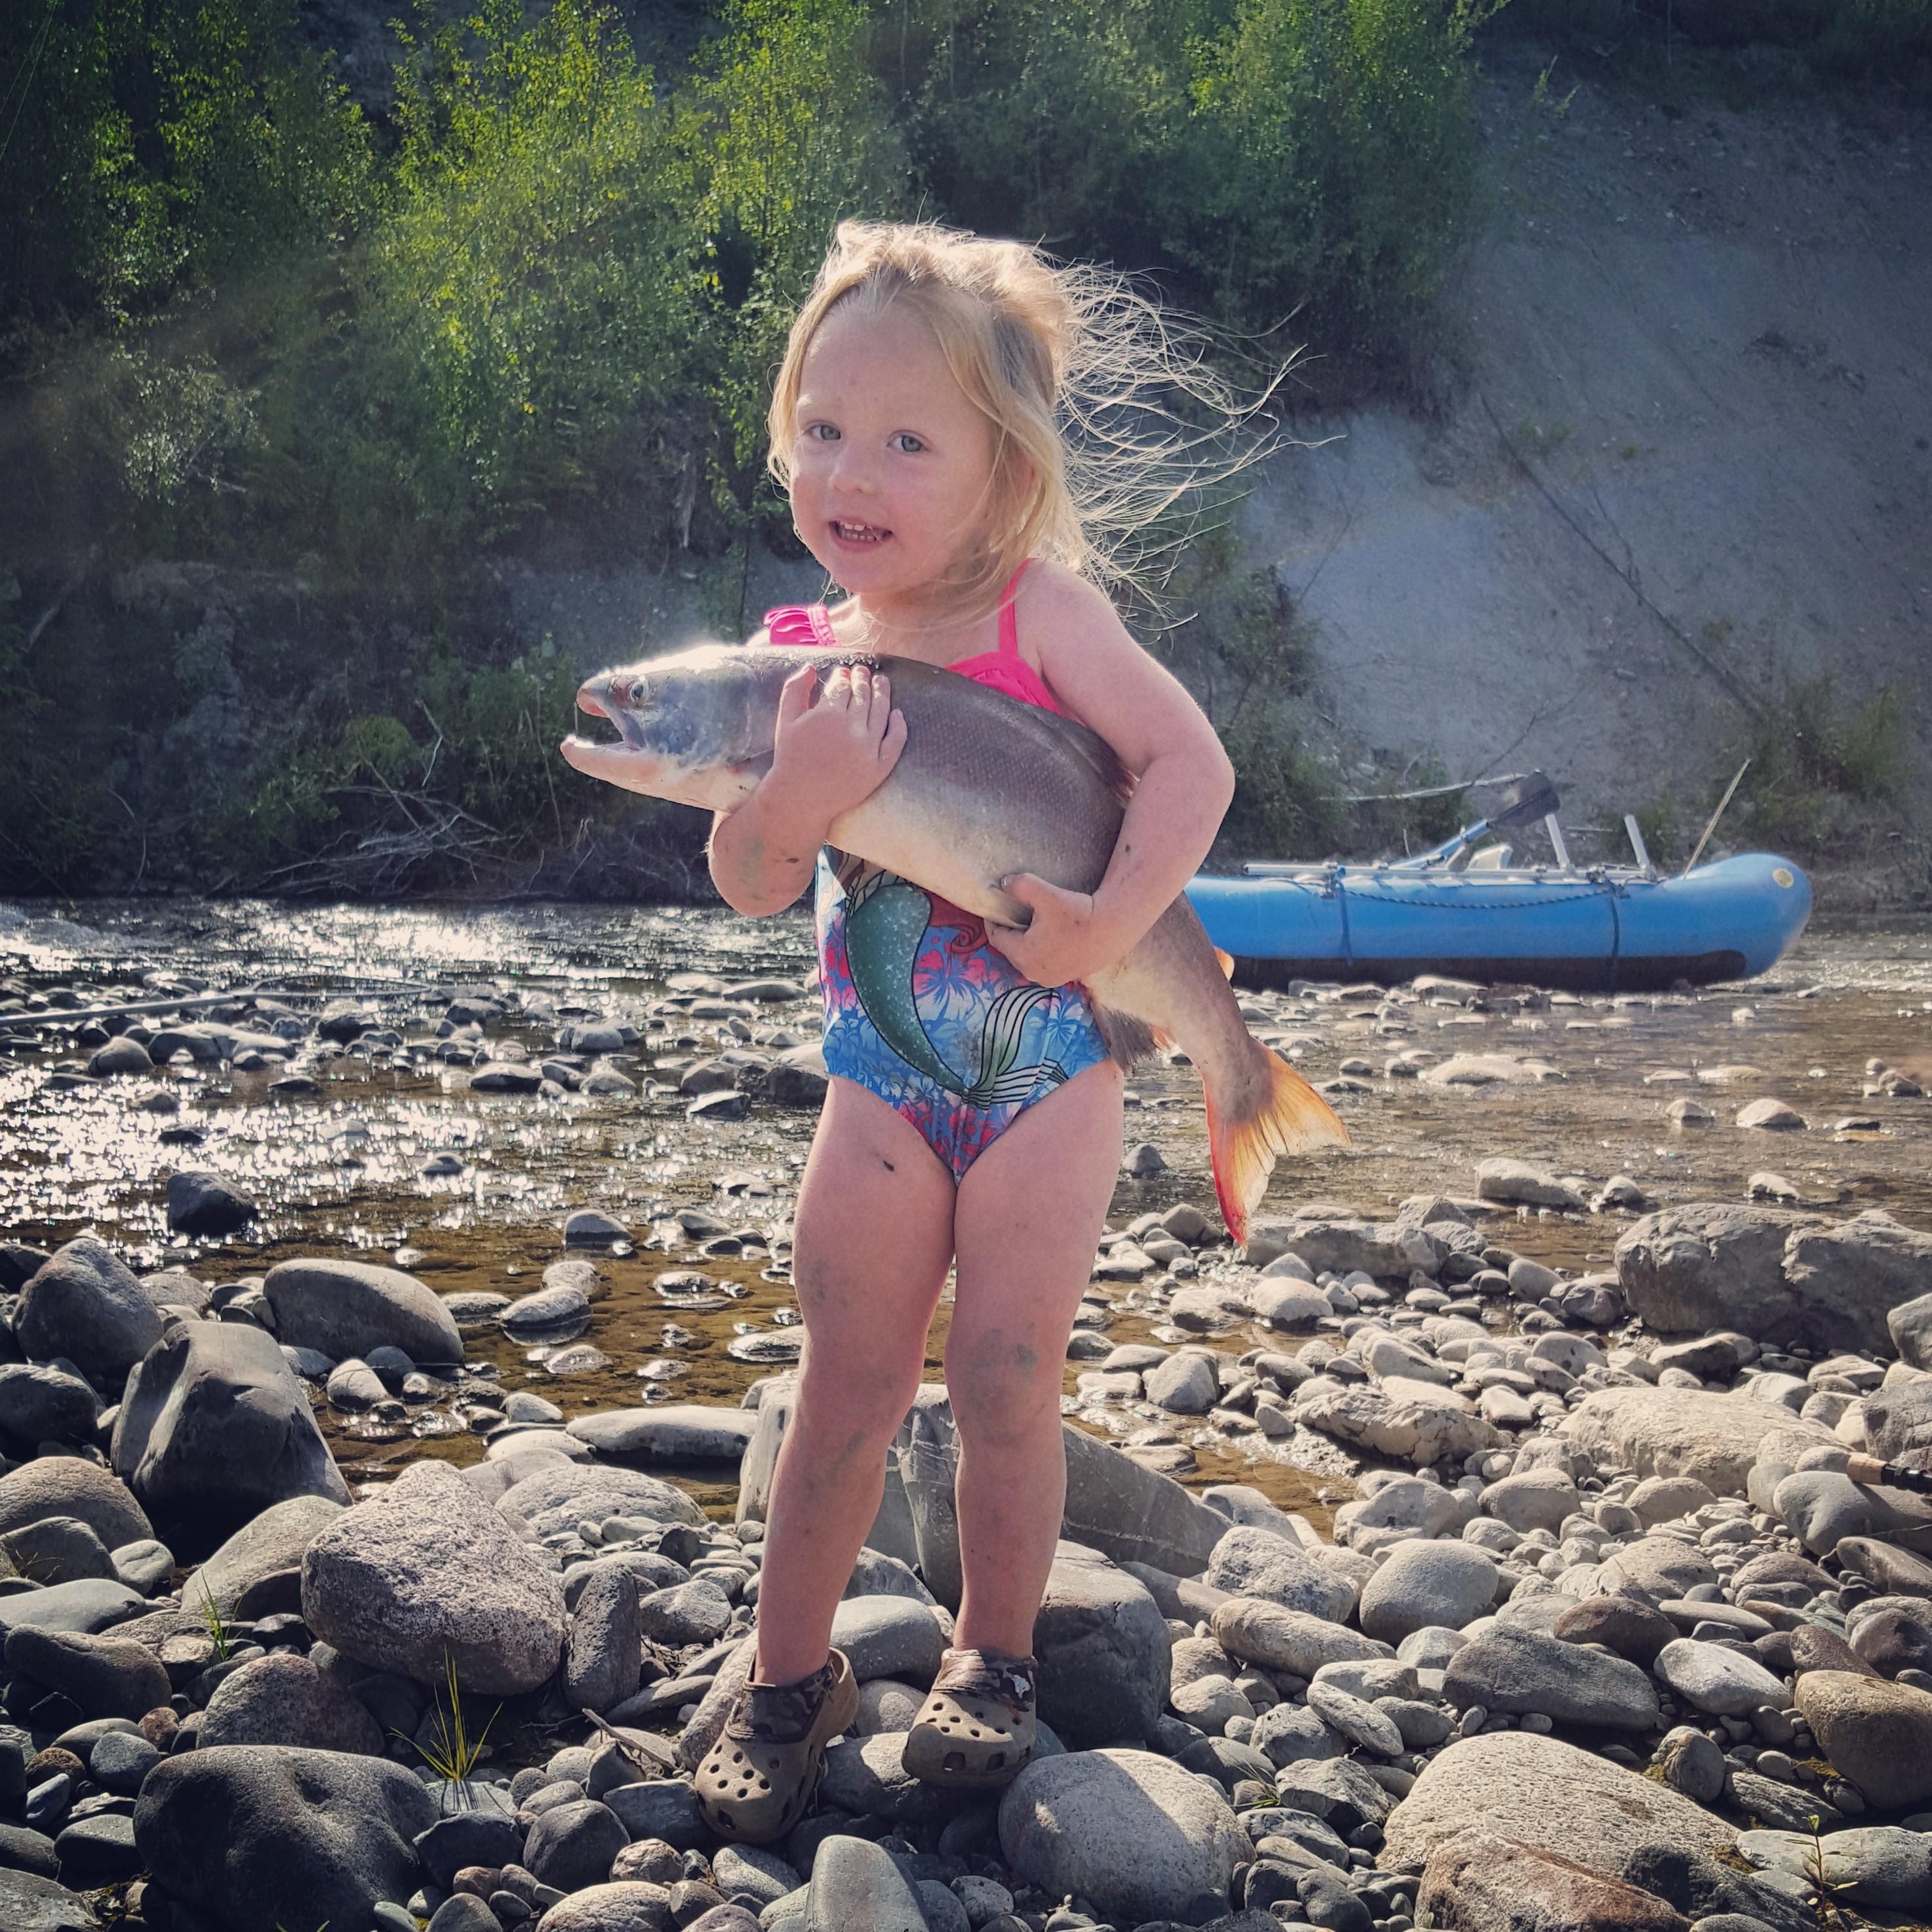 Sockeye Salmon, rafting with kids, children, paddling, boating, fishing